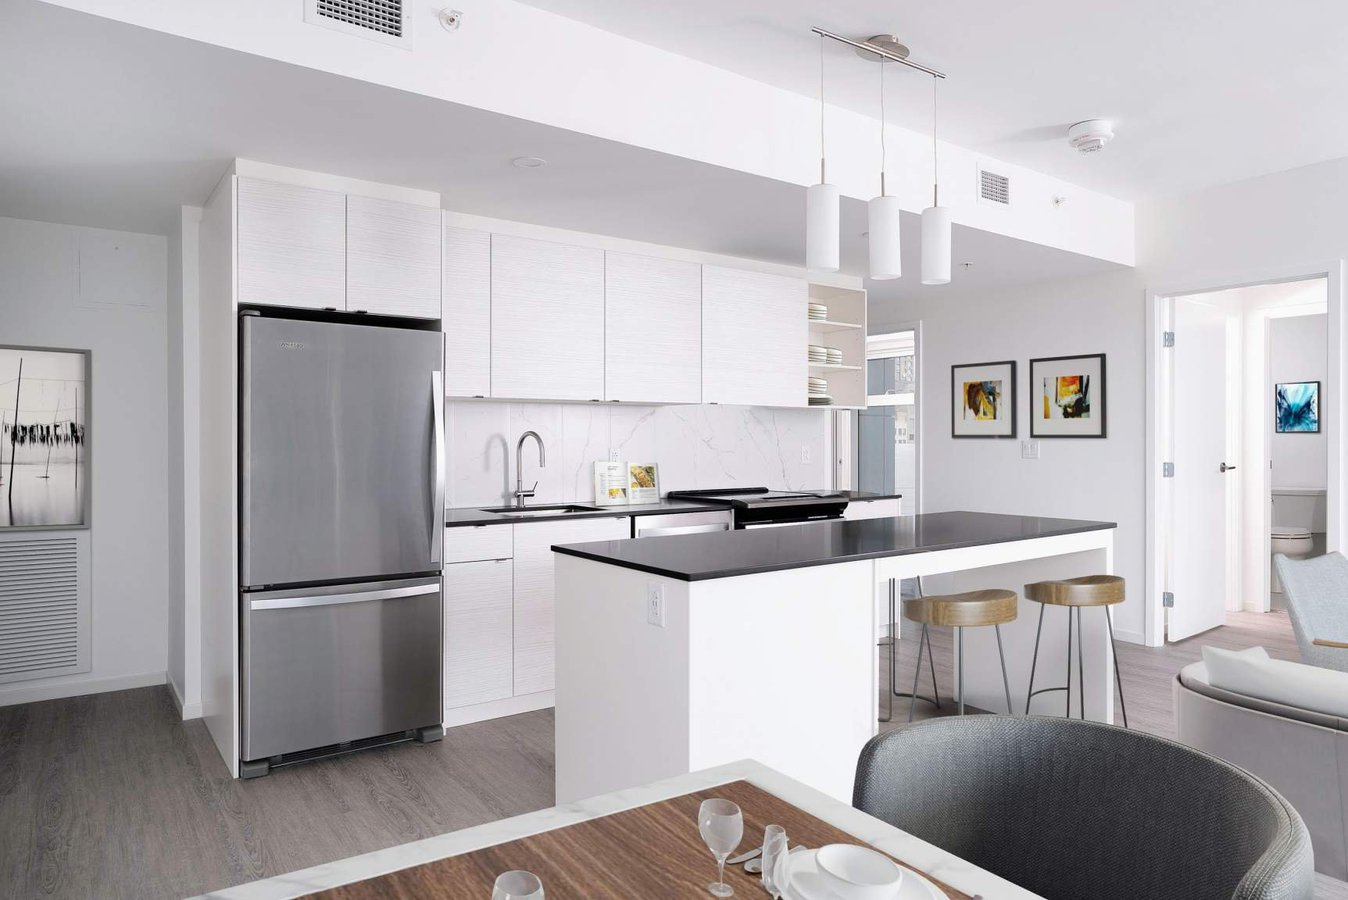 Rentals Ca Winnipeg Apartments Condos And Houses For Rent